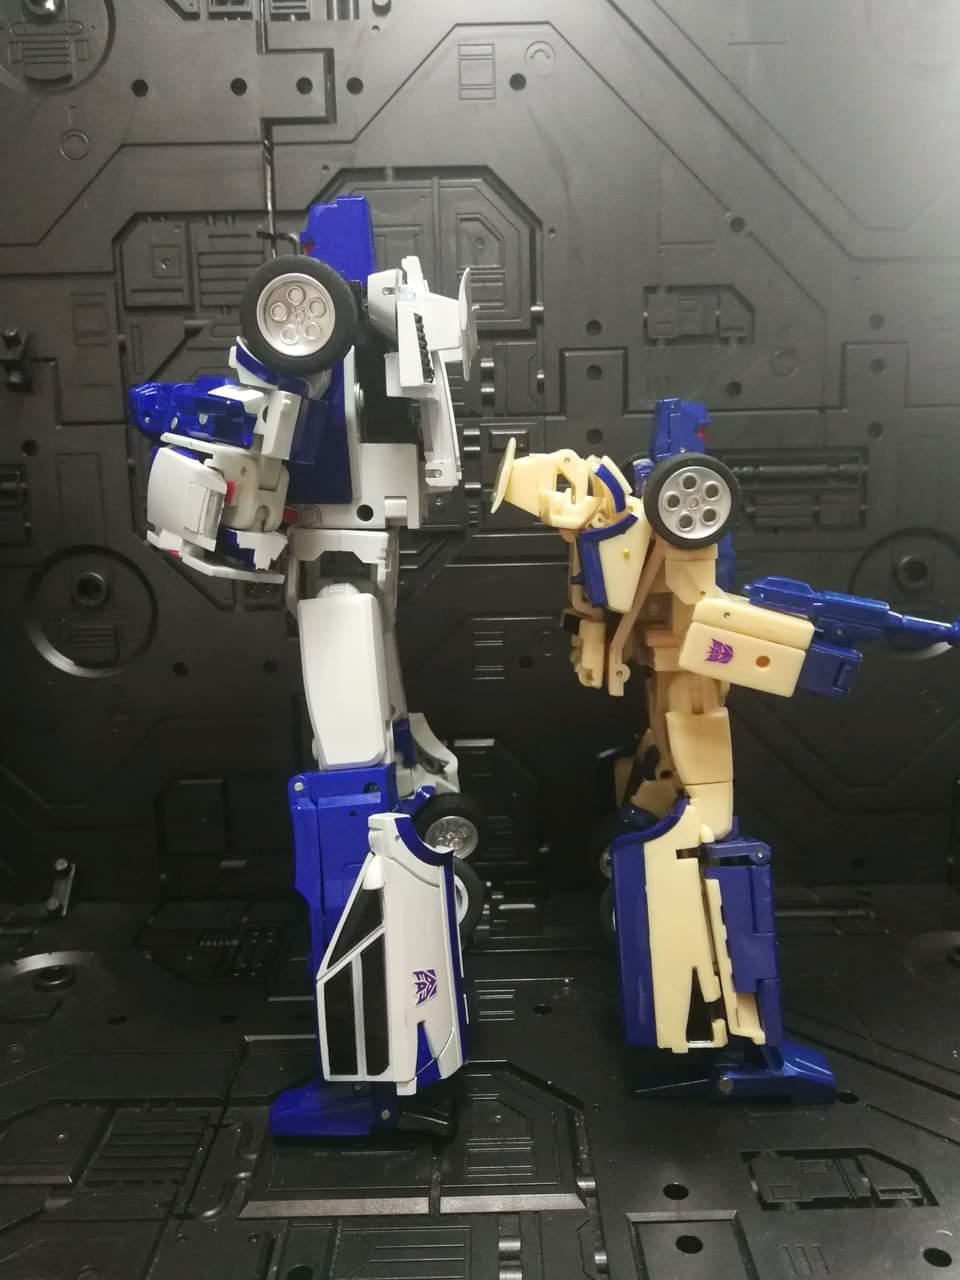 [X-Transbots] Produit Tiers - Jouets Berserkars forme Monolith (MX-XIII à MX-VII) - aka Stunticons forme Menasor/Menaseur - Page 6 P0iNkESE_o